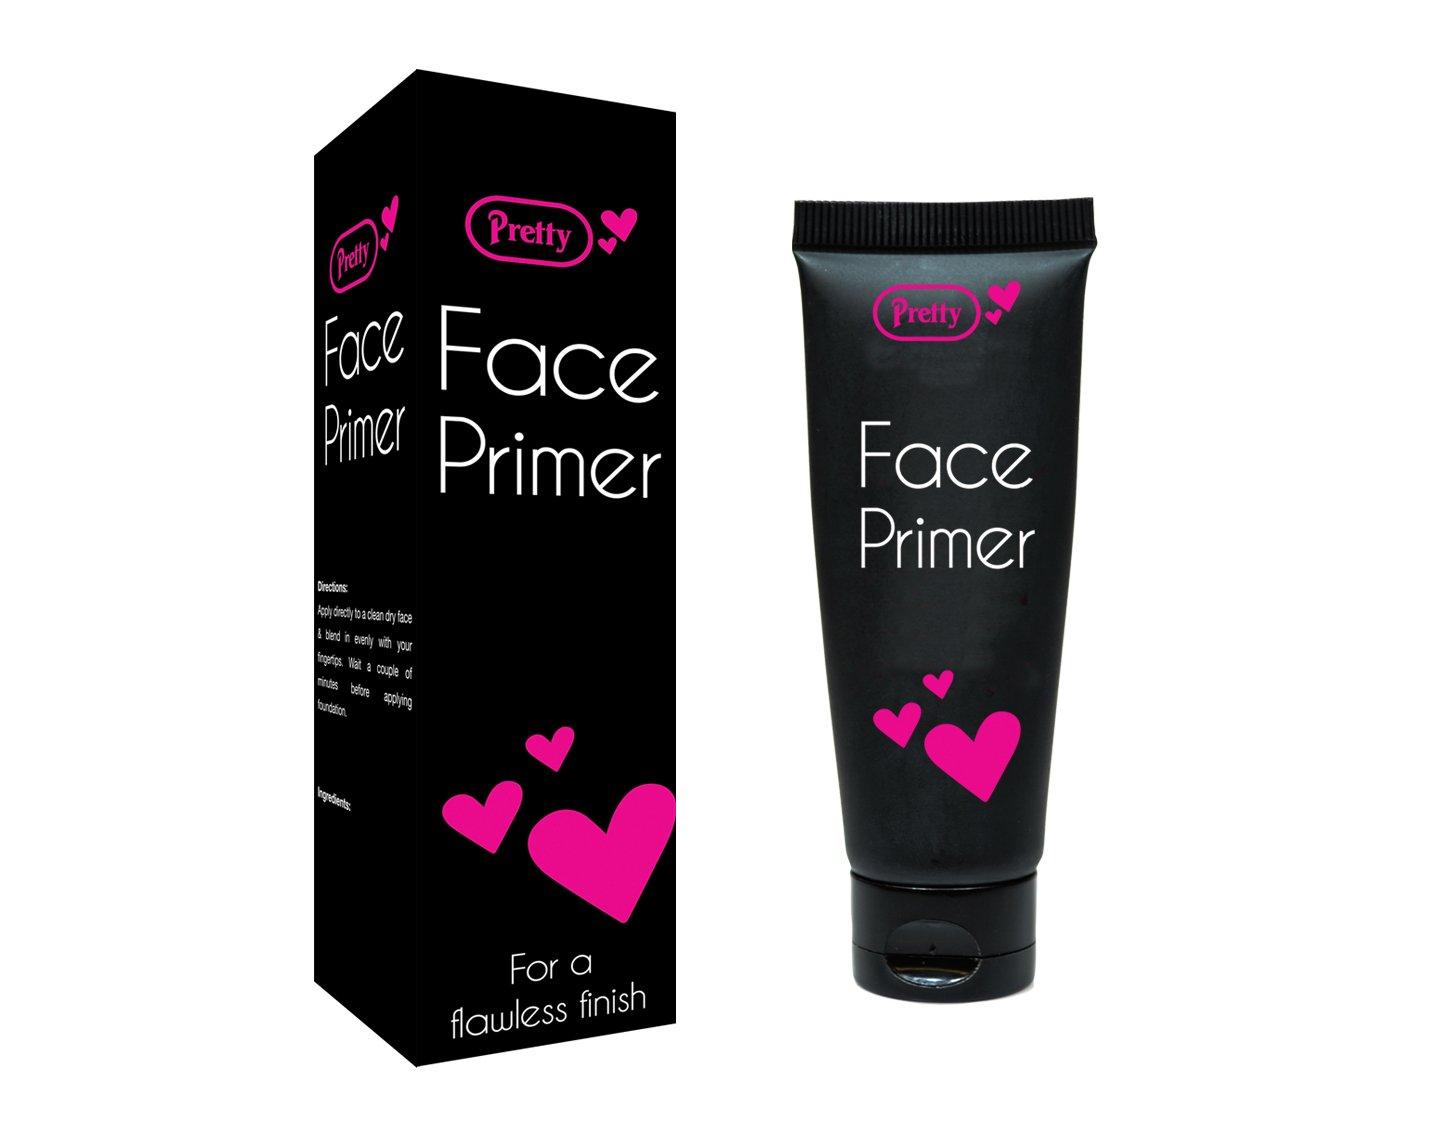 3 x Pretty Face Primer - Flawless Finish (3 x 30ml) Quest